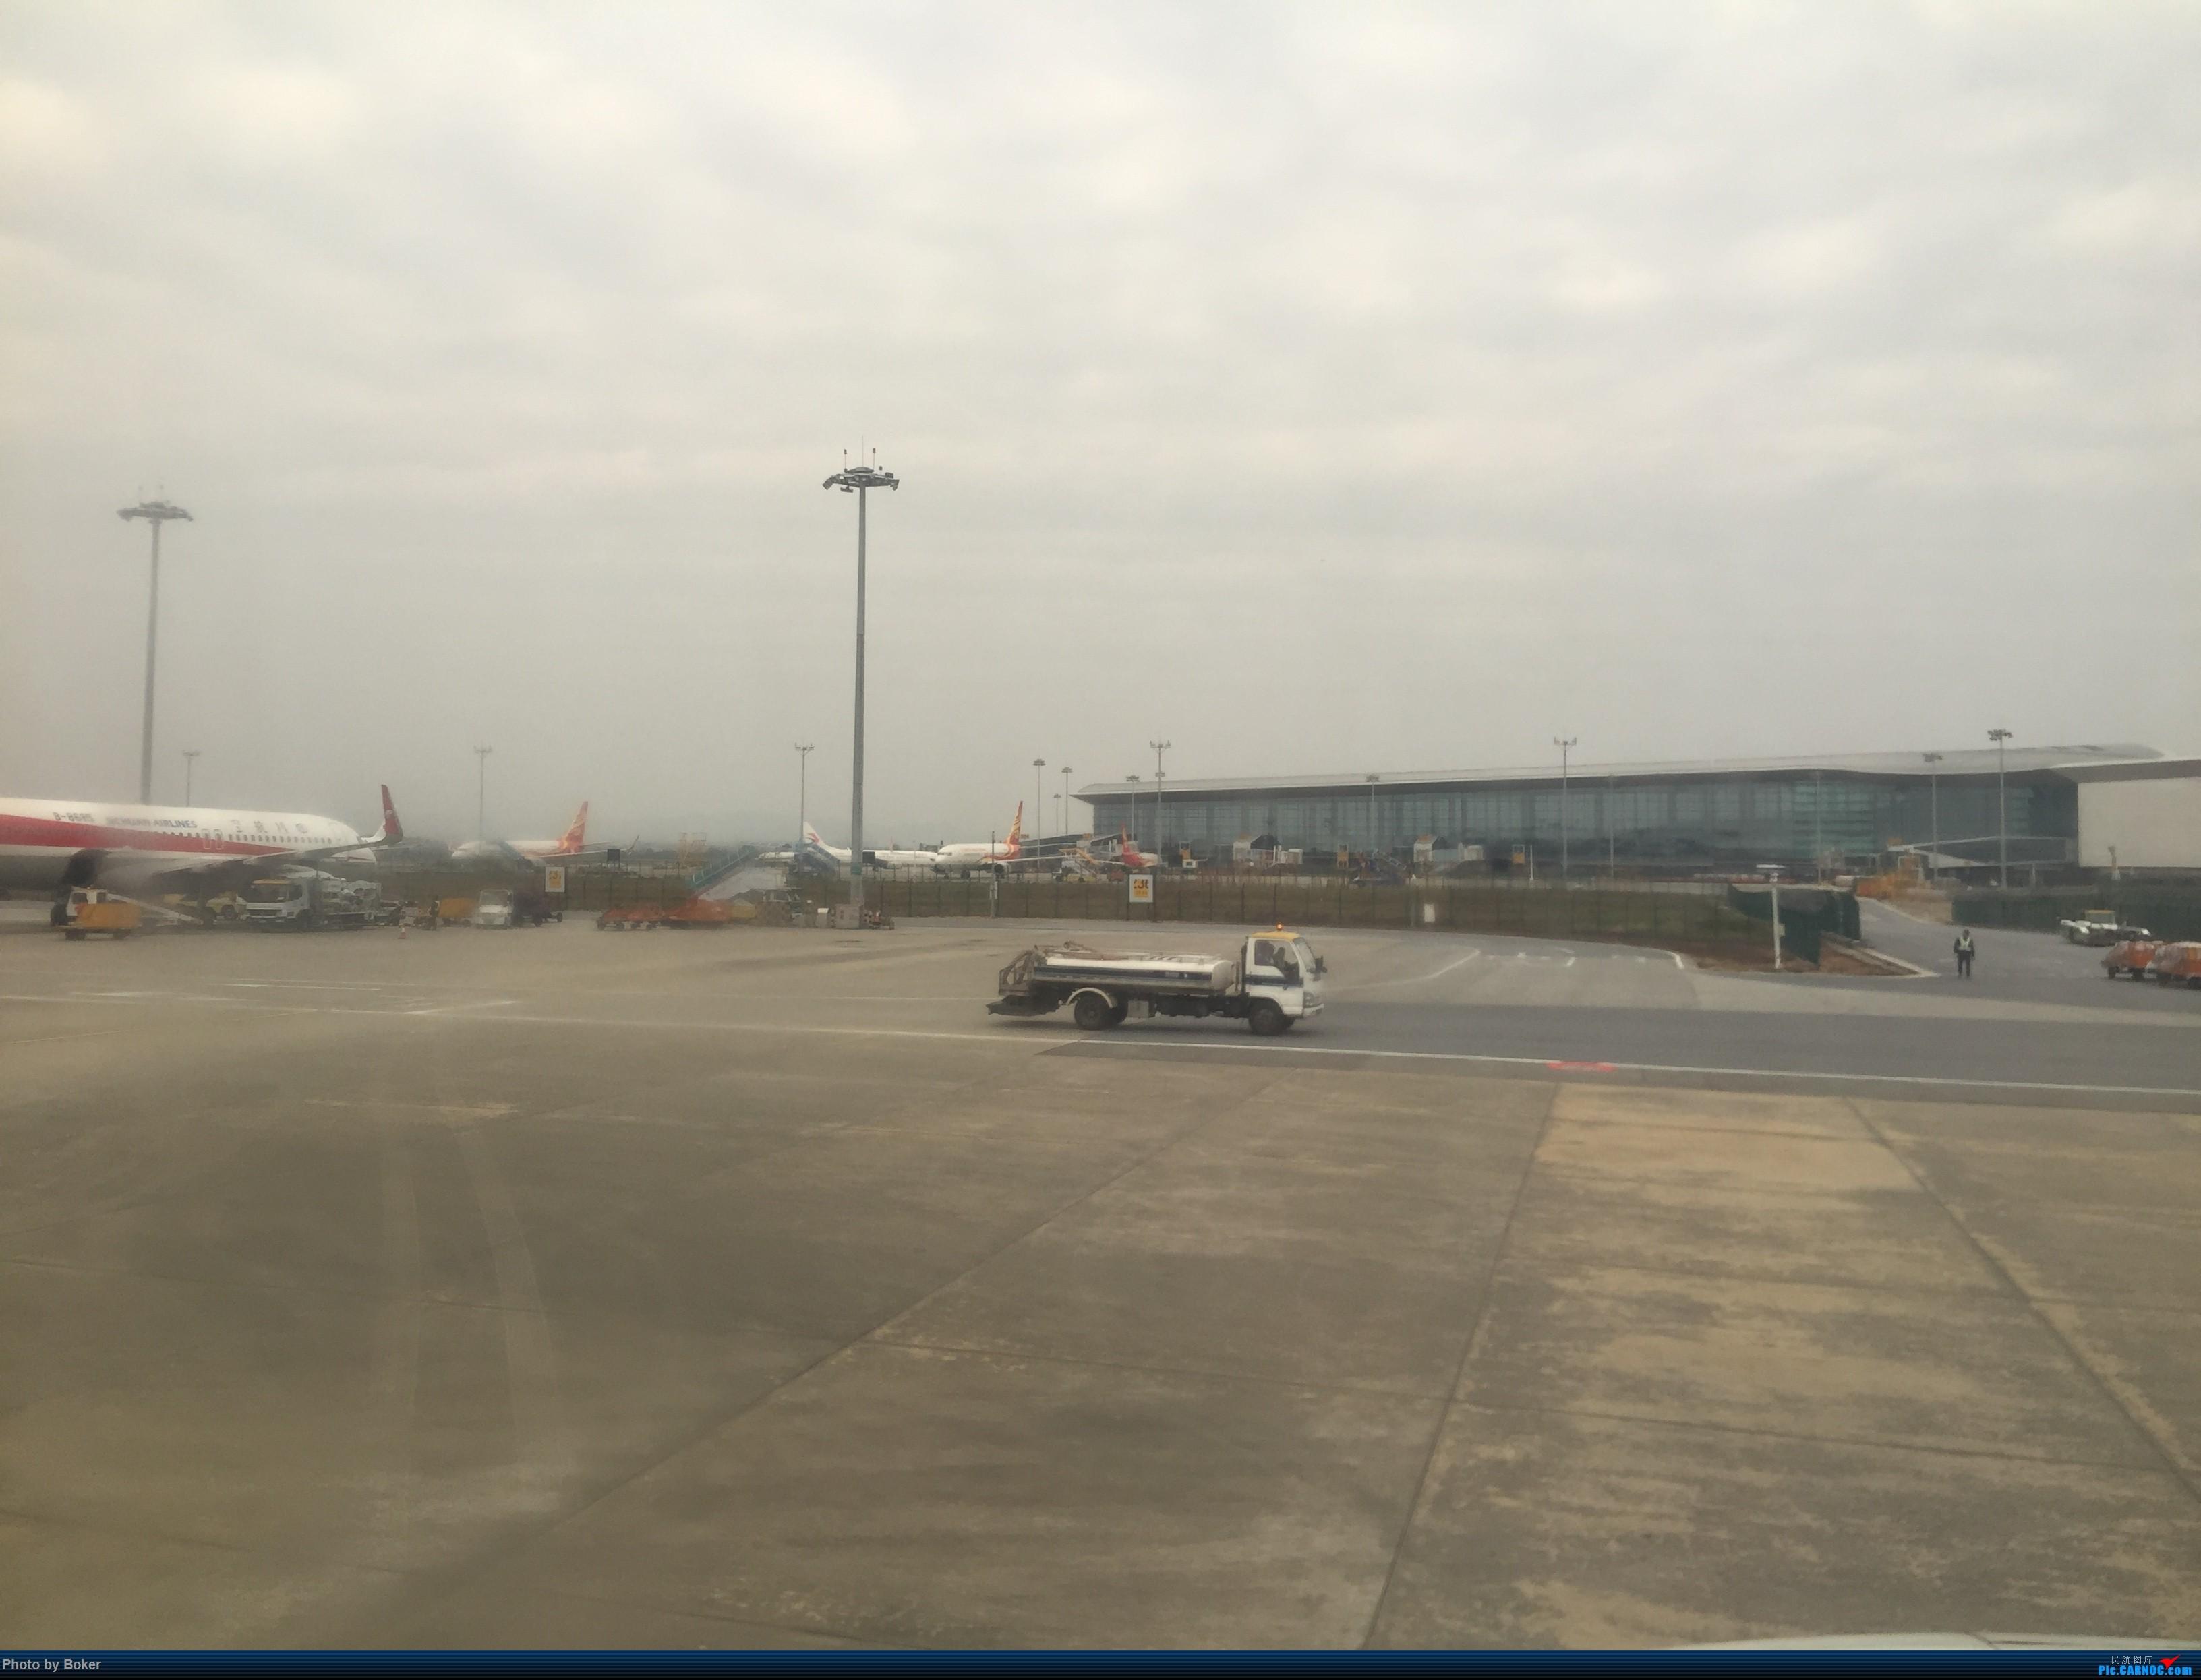 Re:[原创]「BoKer的飞行游记」新人首次发帖 中国东方航空 广州-台州 HONGDU N5A B-8615 中国广州白云国际机场